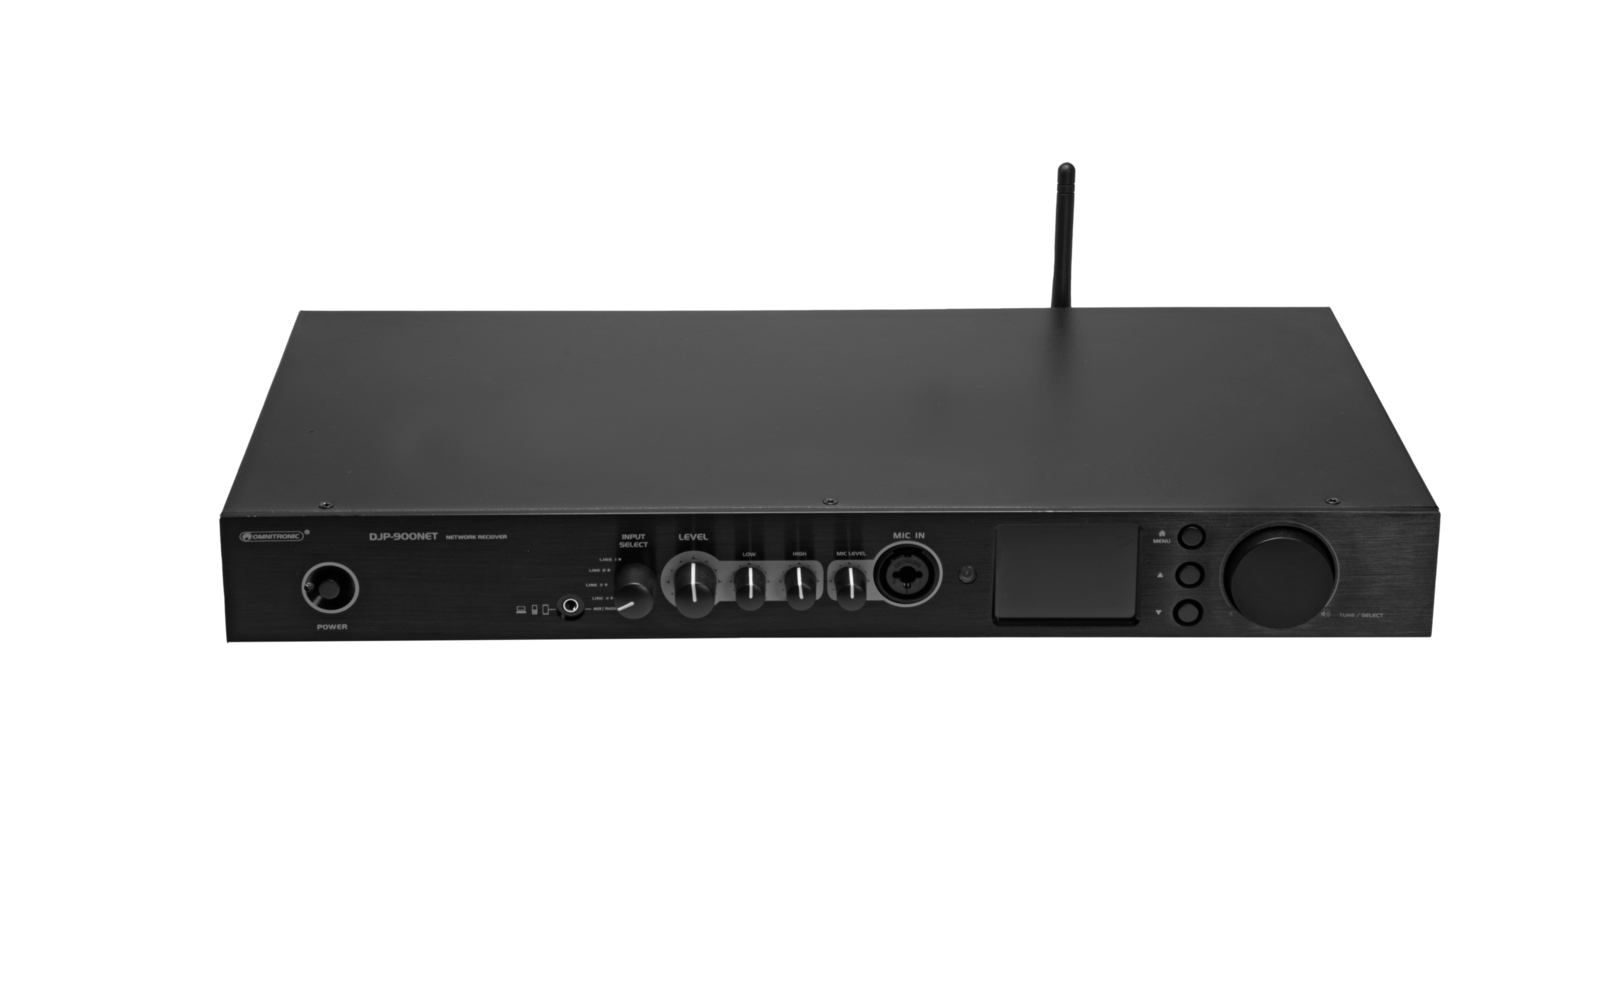 OMNITRONIC DJP-900NET Class-D Verstärker mit Internetradio